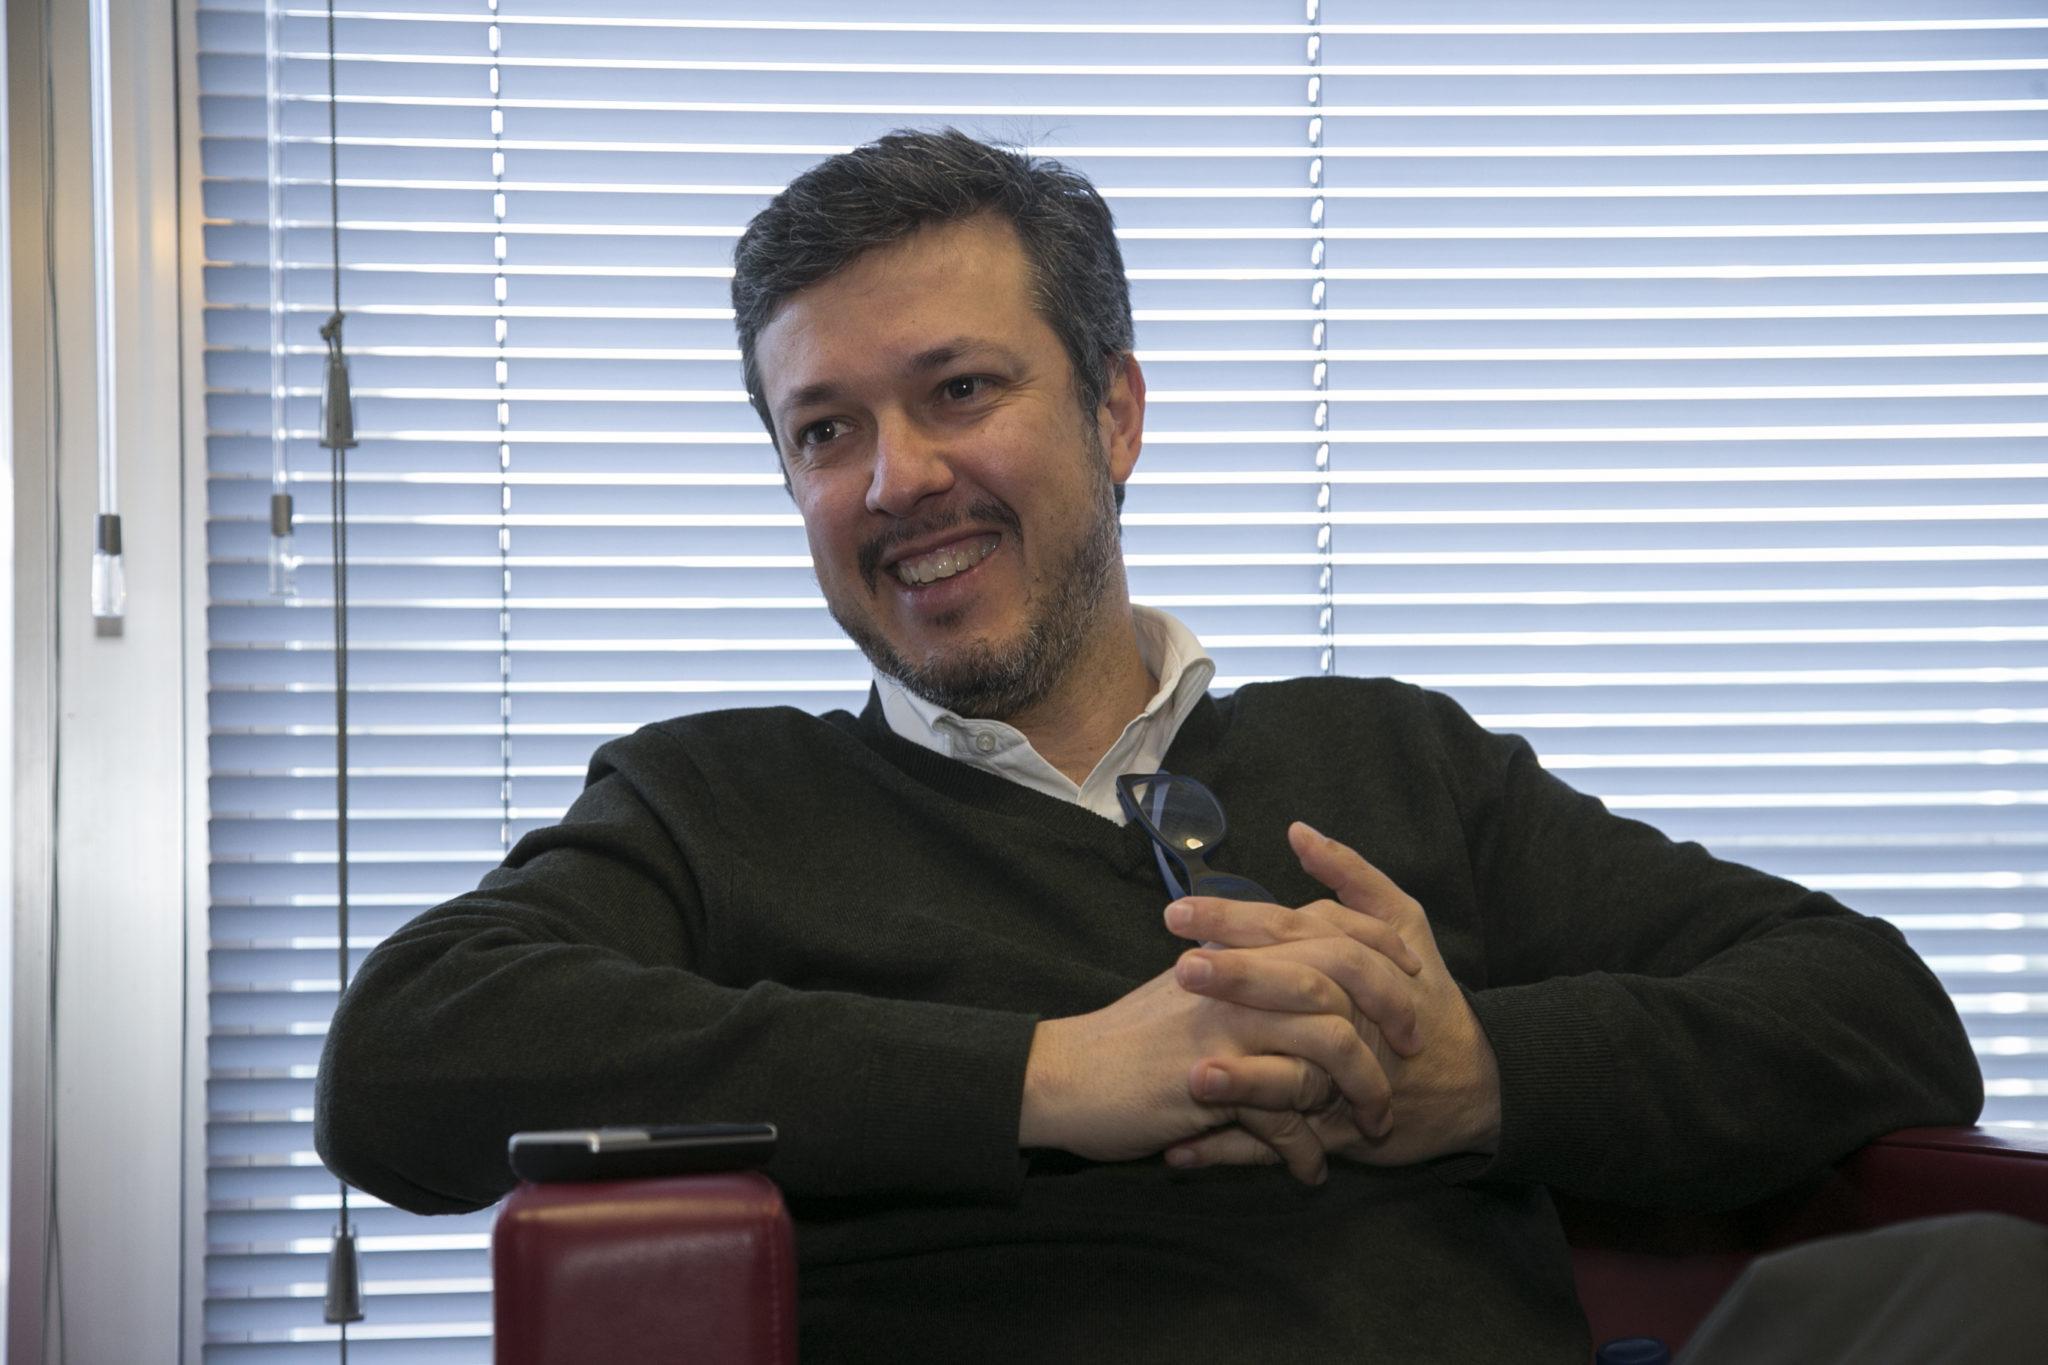 Bruno Santos, director-geral de antenas e programas da TVI